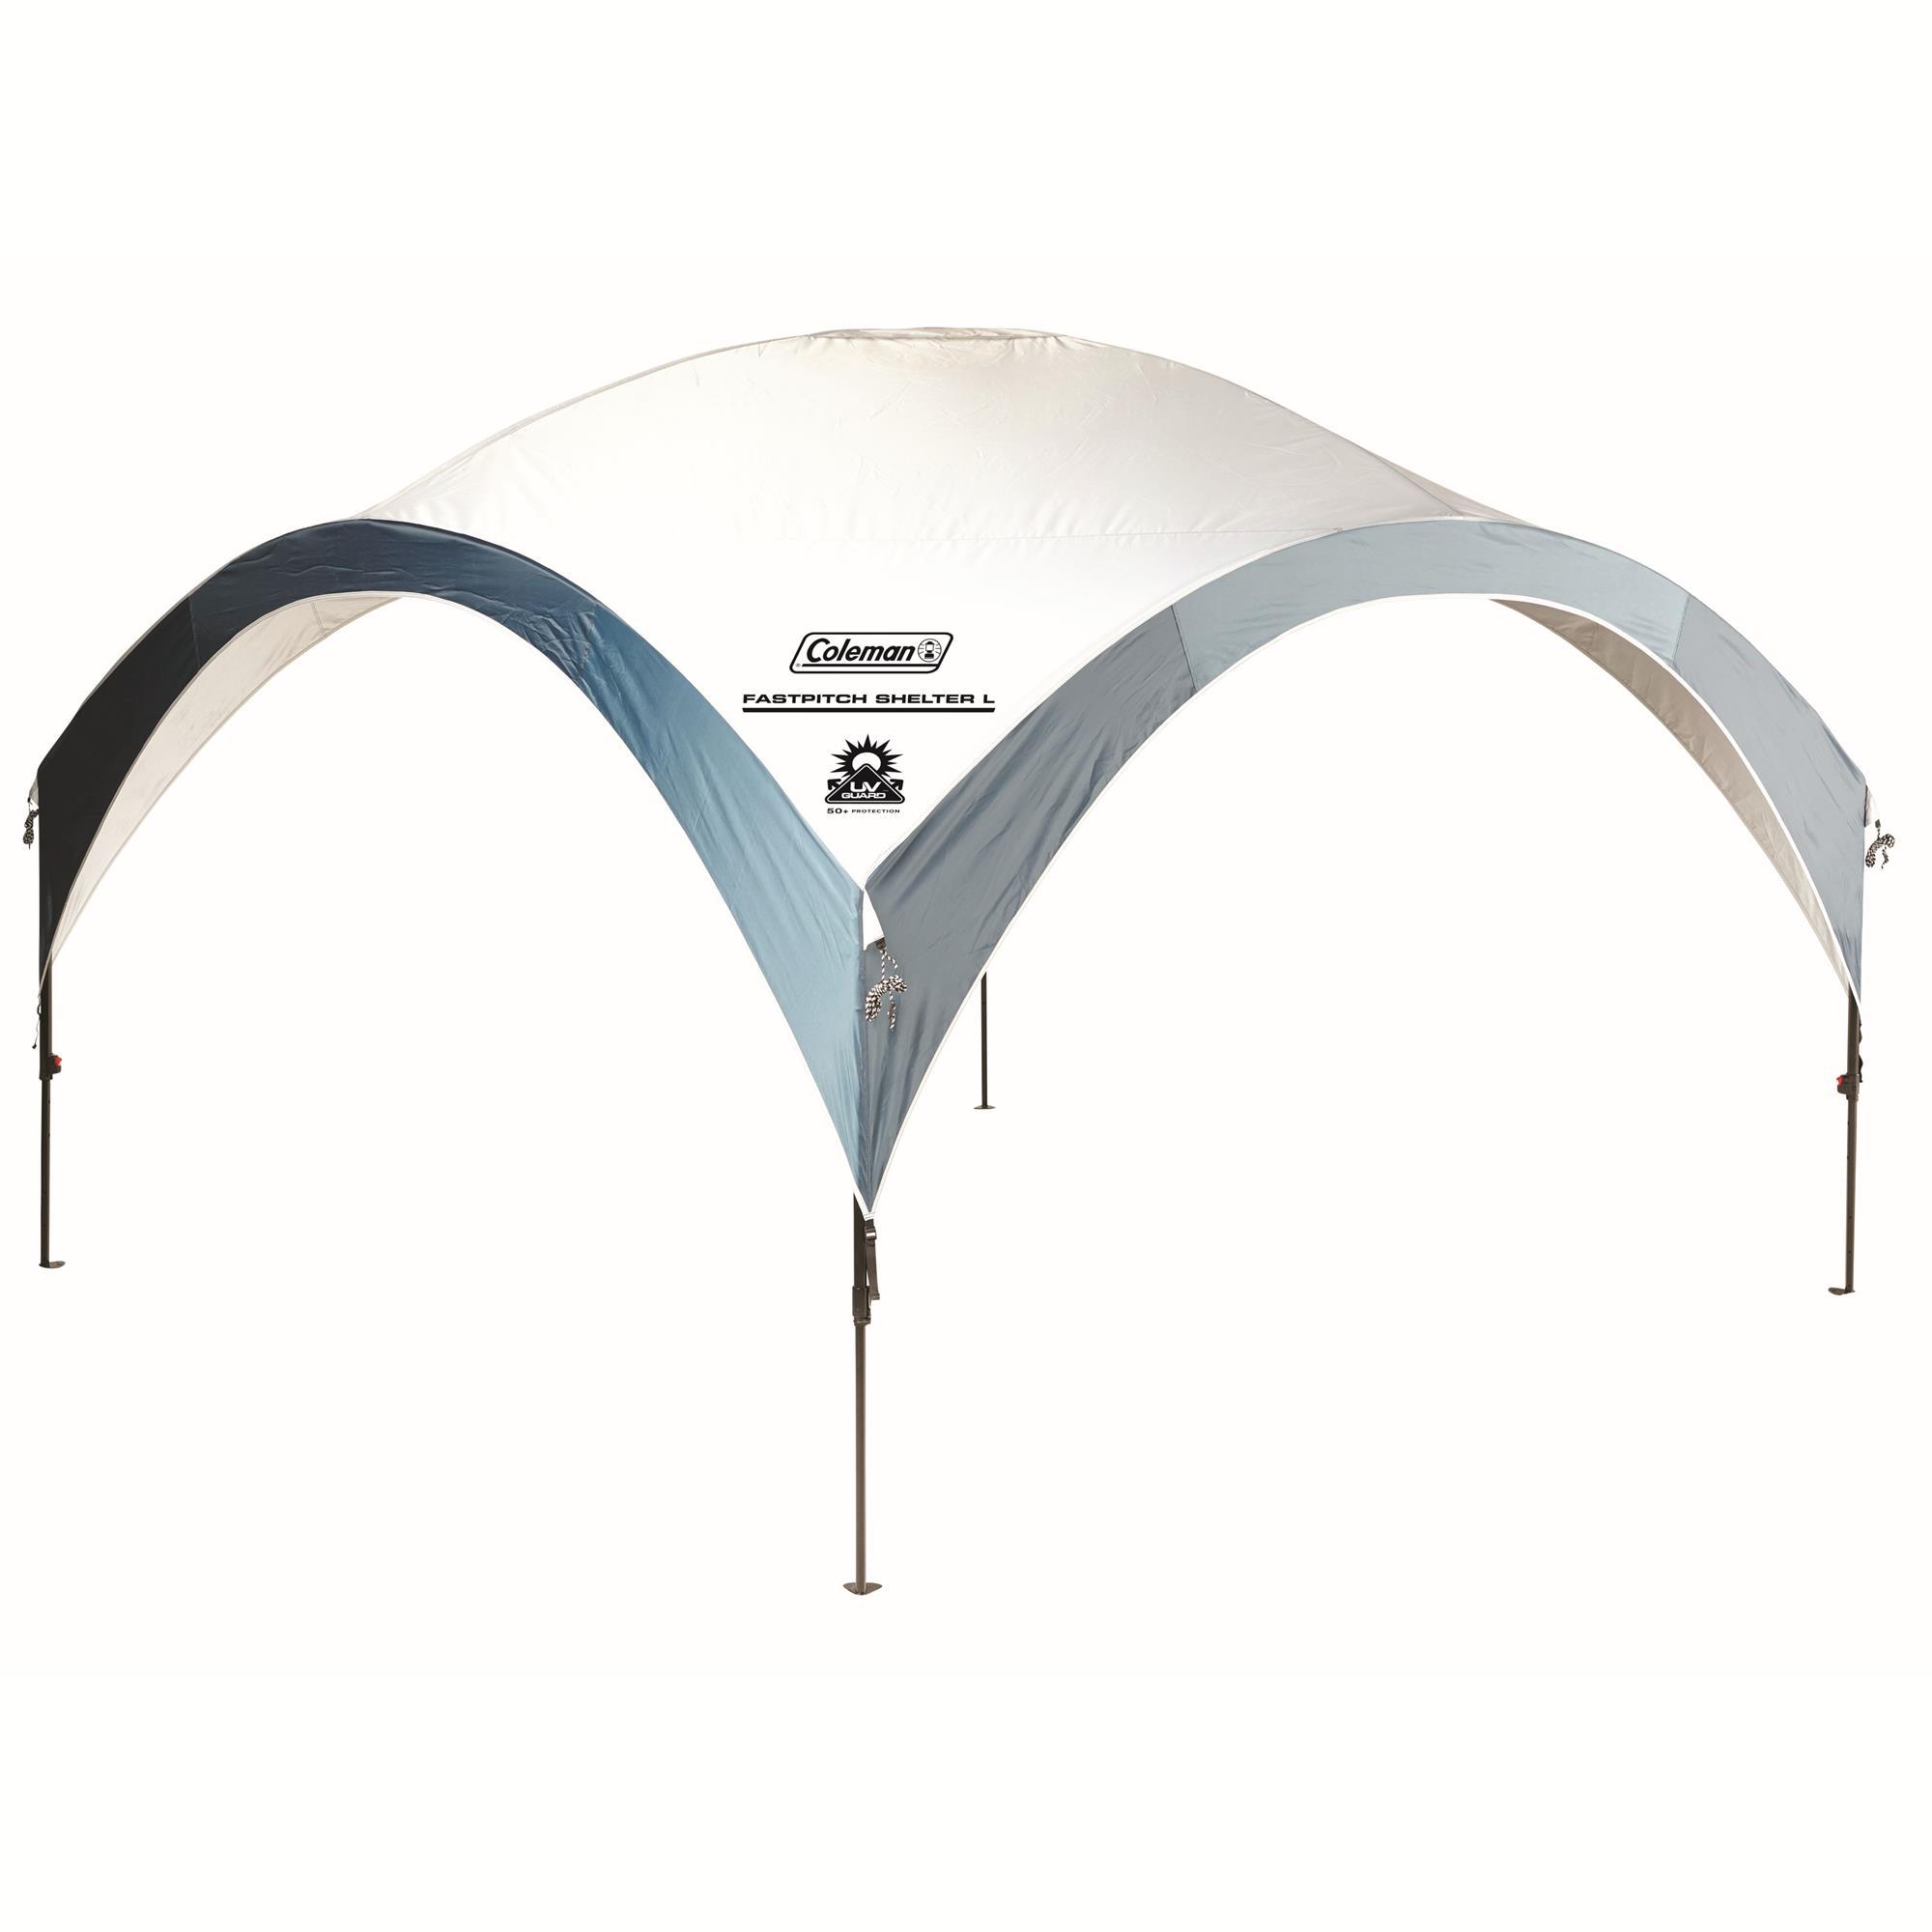 Coleman Fast Pitch Shelter XL Pavillon weiss/blau